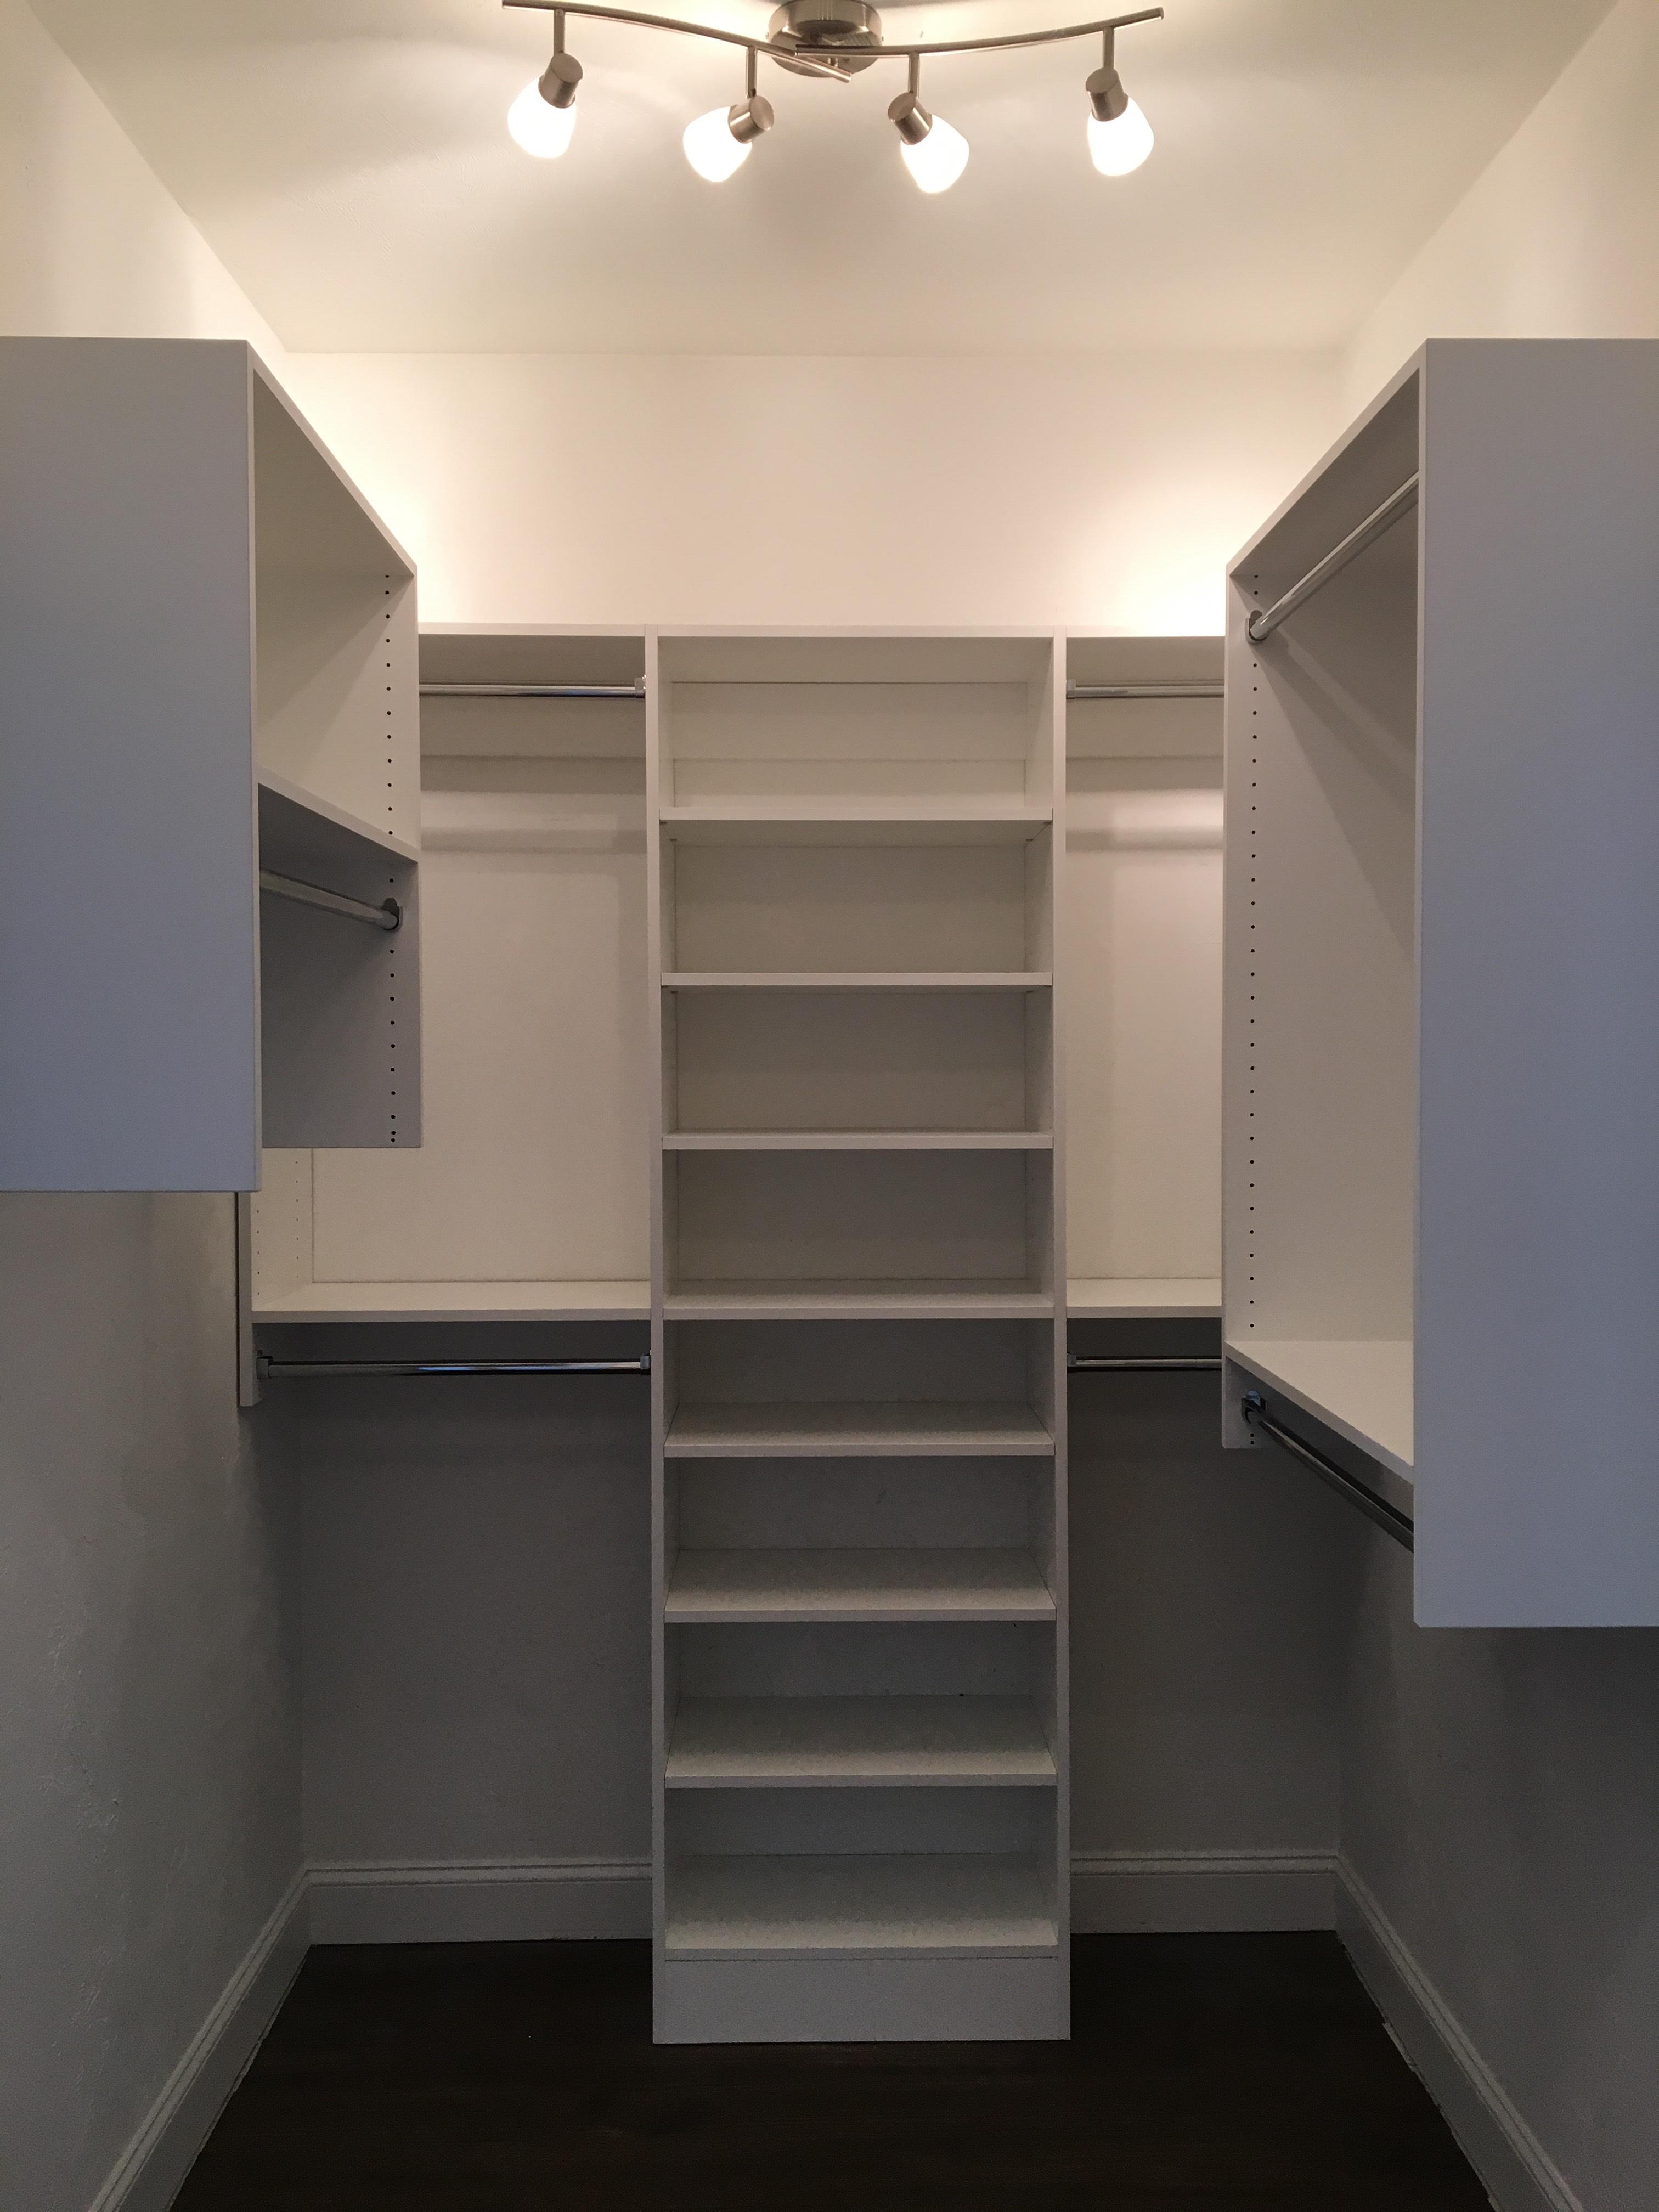 White Classica Wall Mounted Shelves